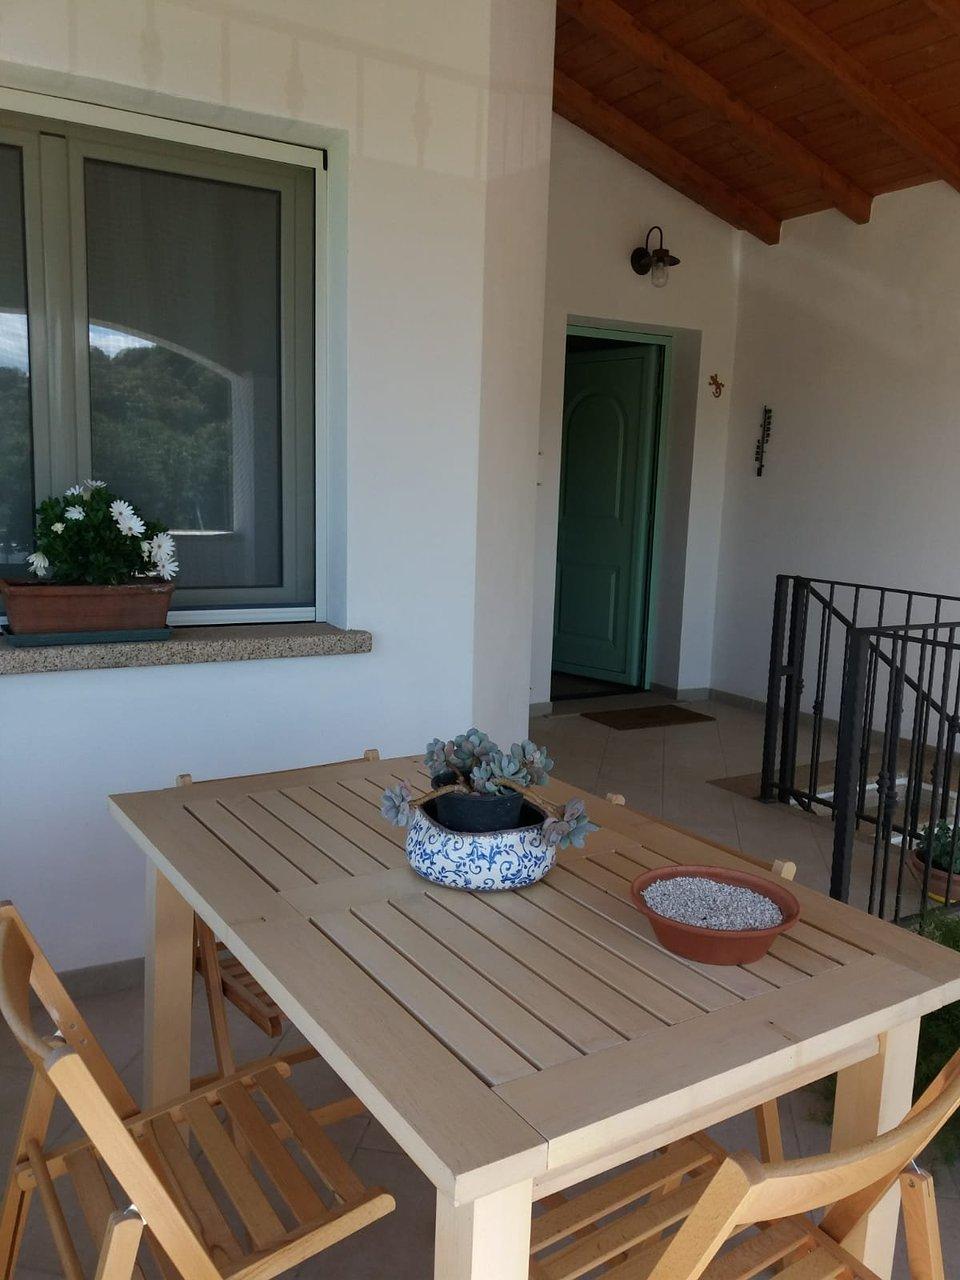 B B PIBITZOI Prices Reviews Nurallao Italy Tripadvisor